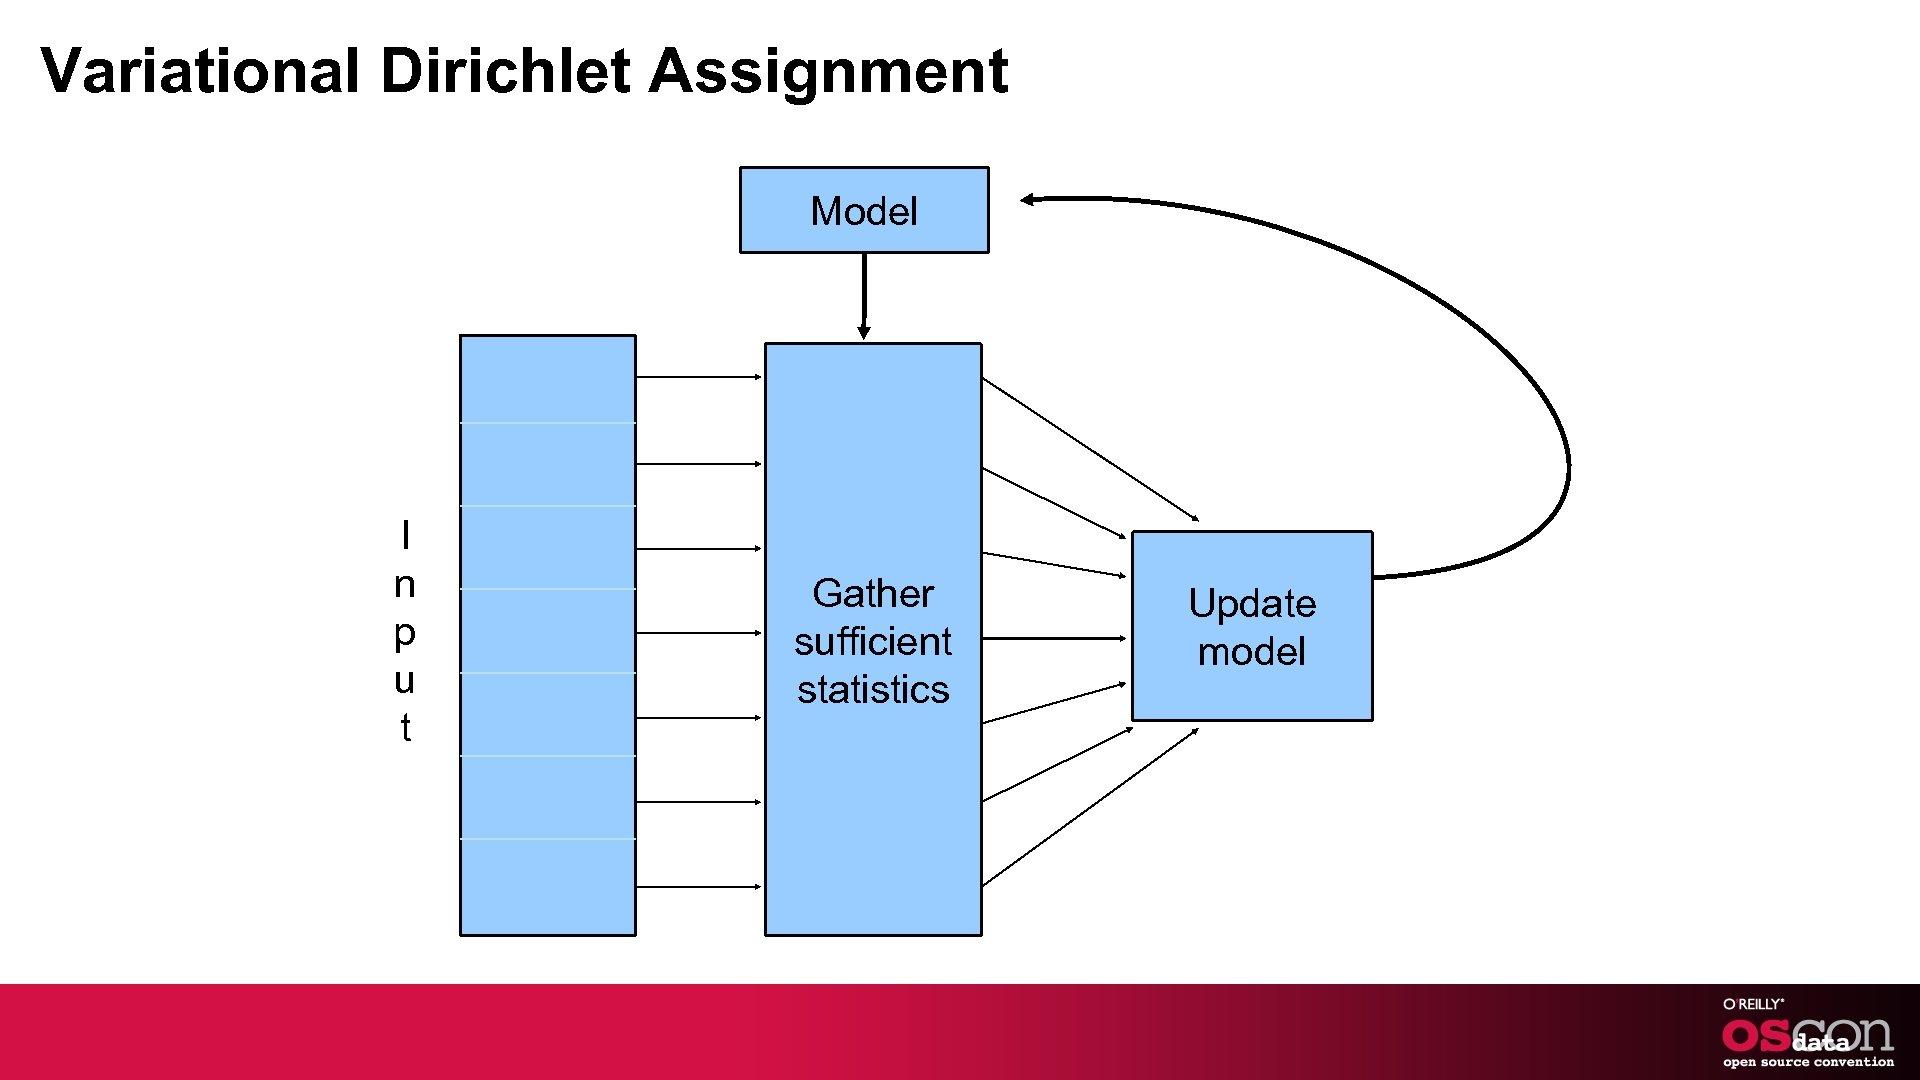 Variational Dirichlet Assignment Model I n p u t Gather sufficient statistics Update model